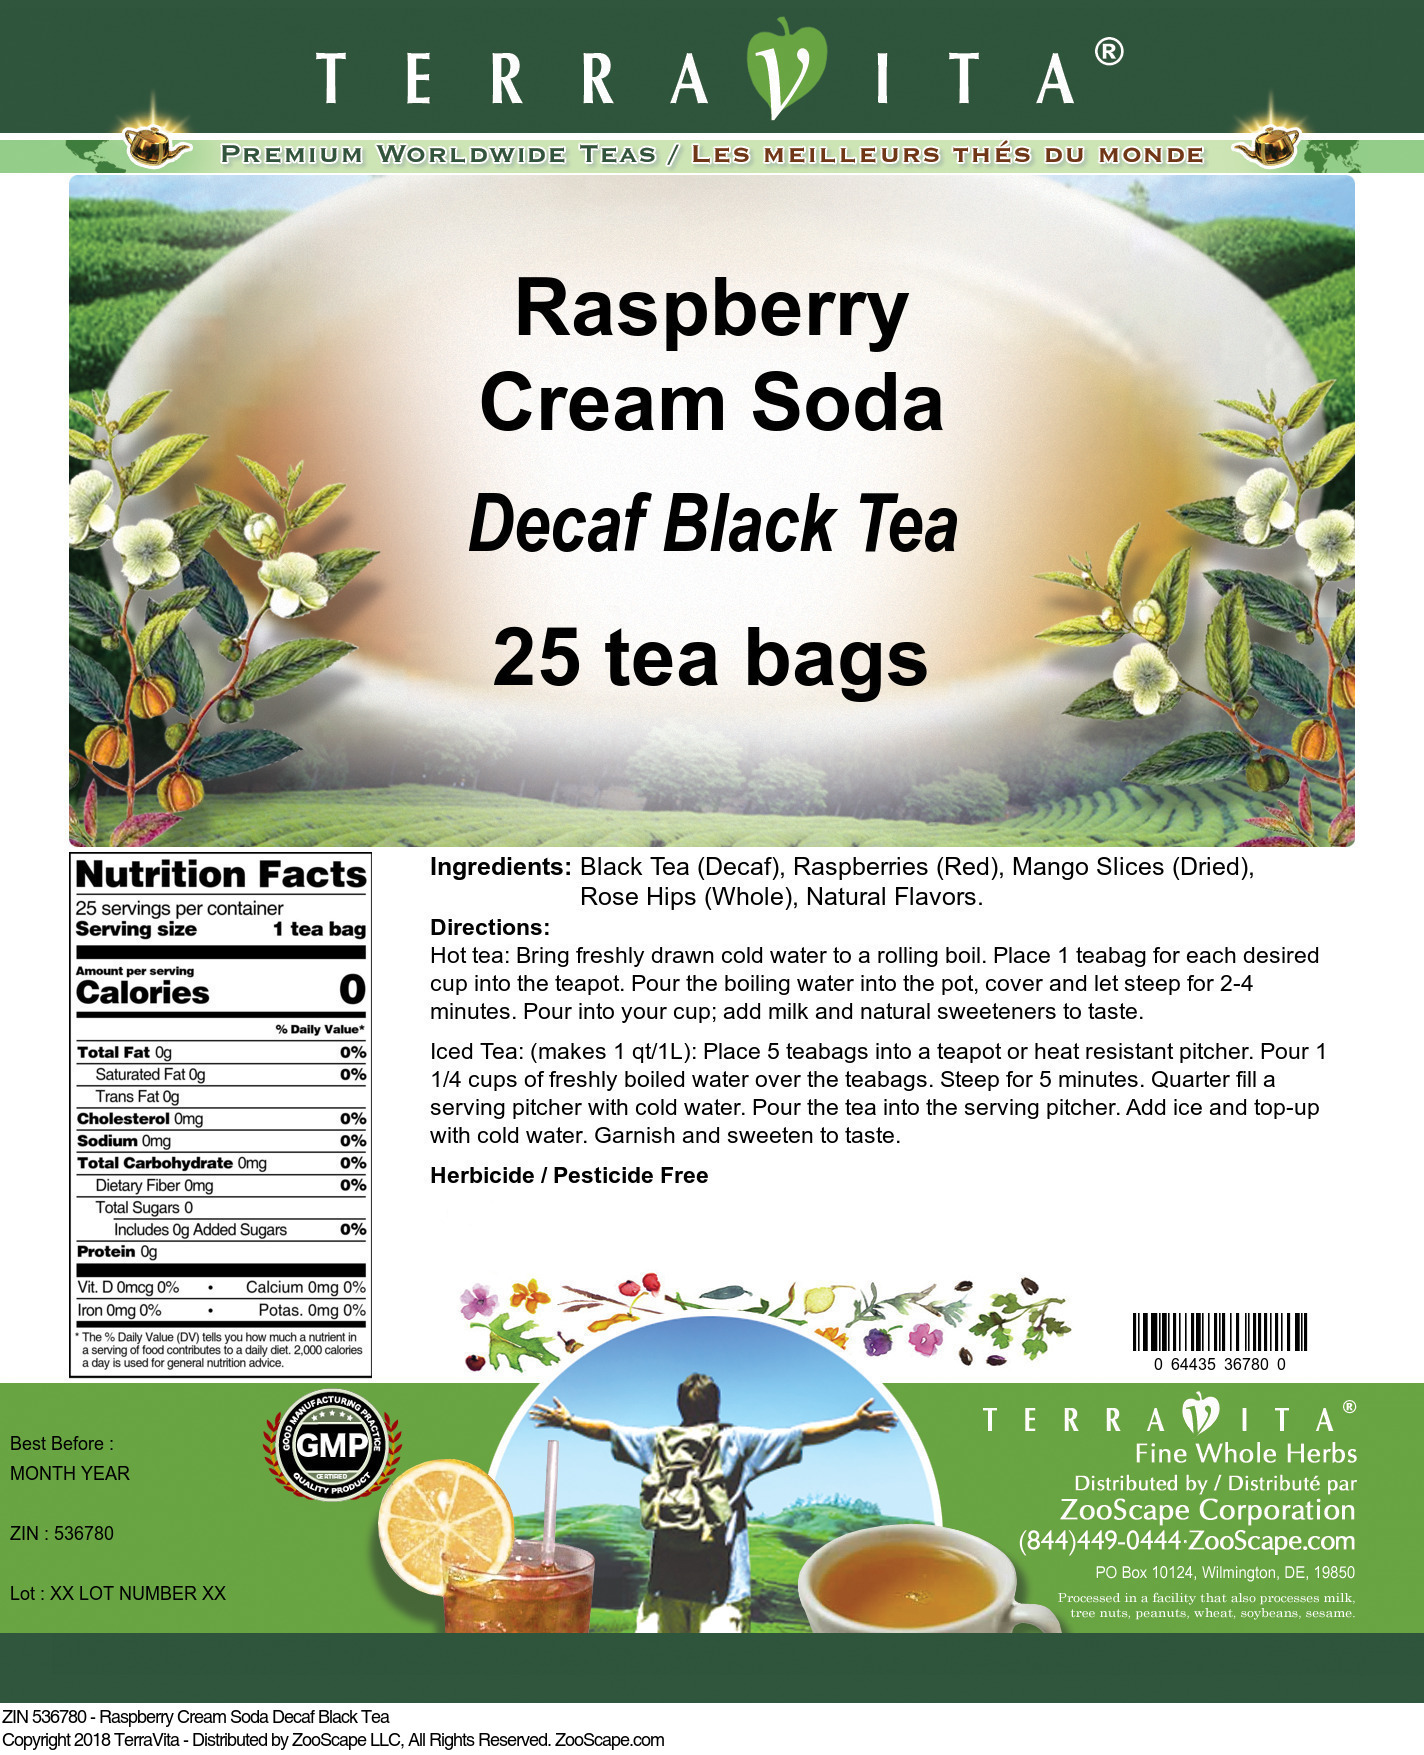 Raspberry Cream Soda Decaf Black Tea